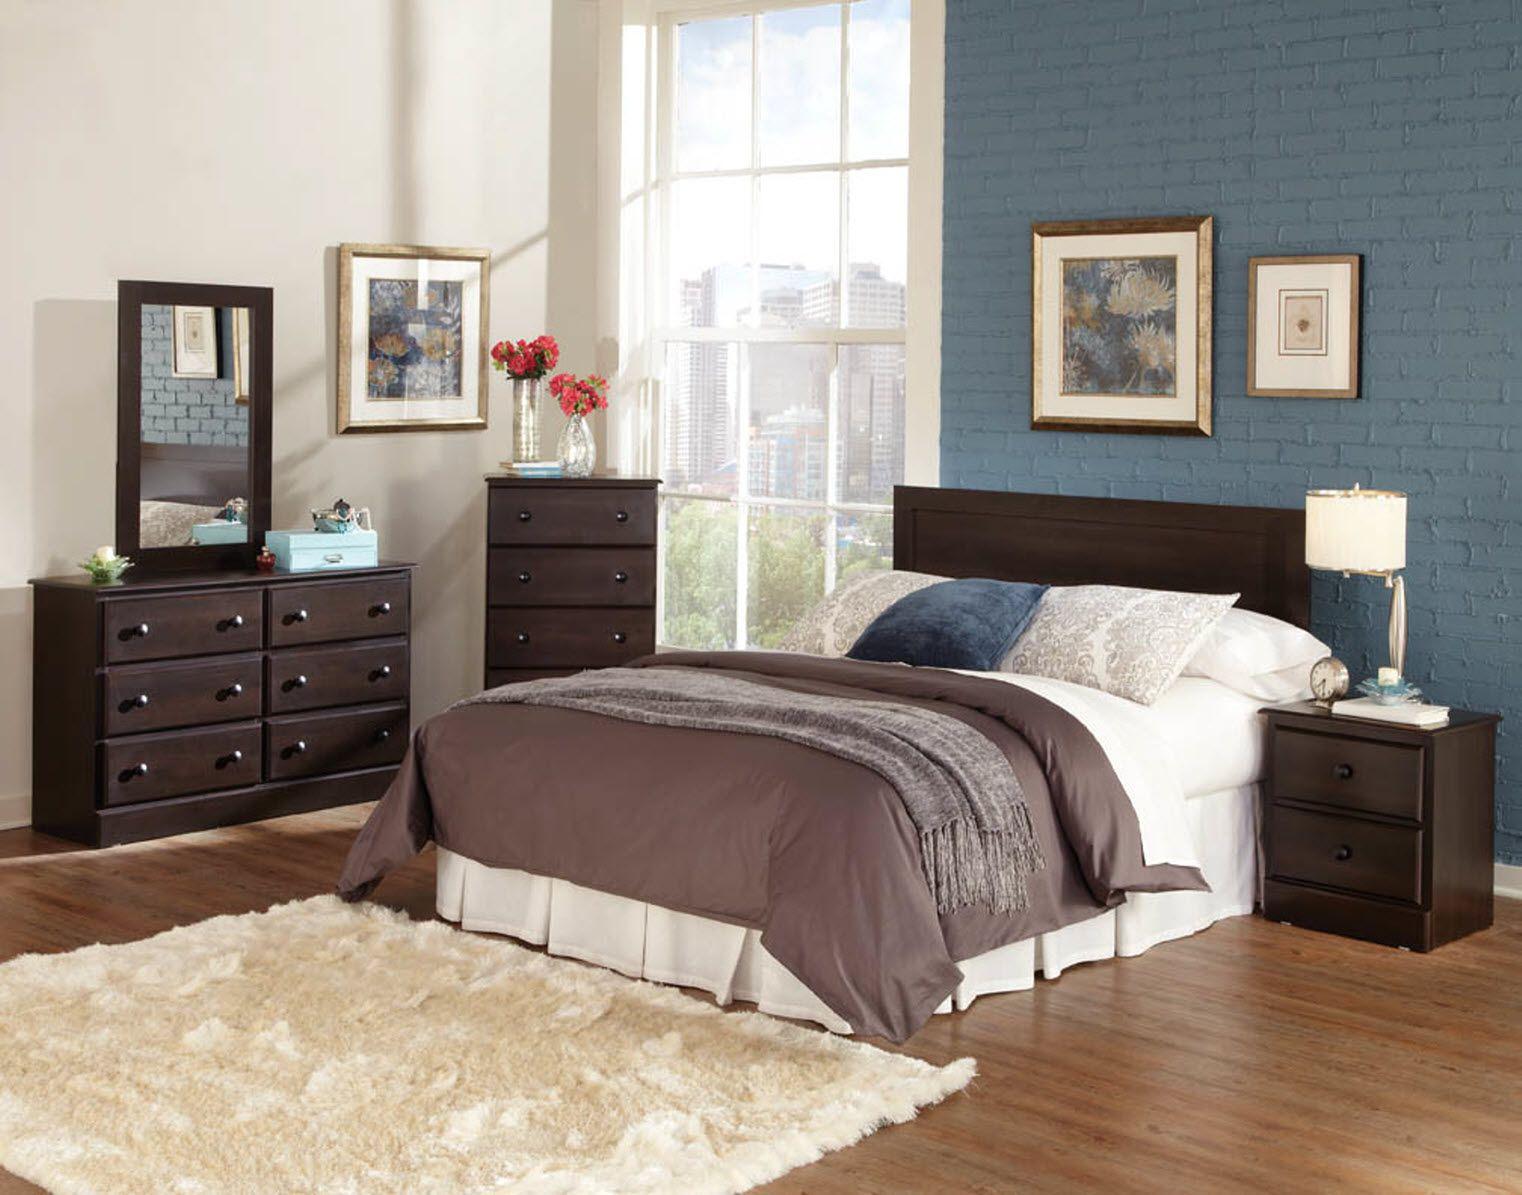 Bedroom Designs Paint Colors Cherrydarkwoodbedroomfurnituredecorforapartmentbrickwall